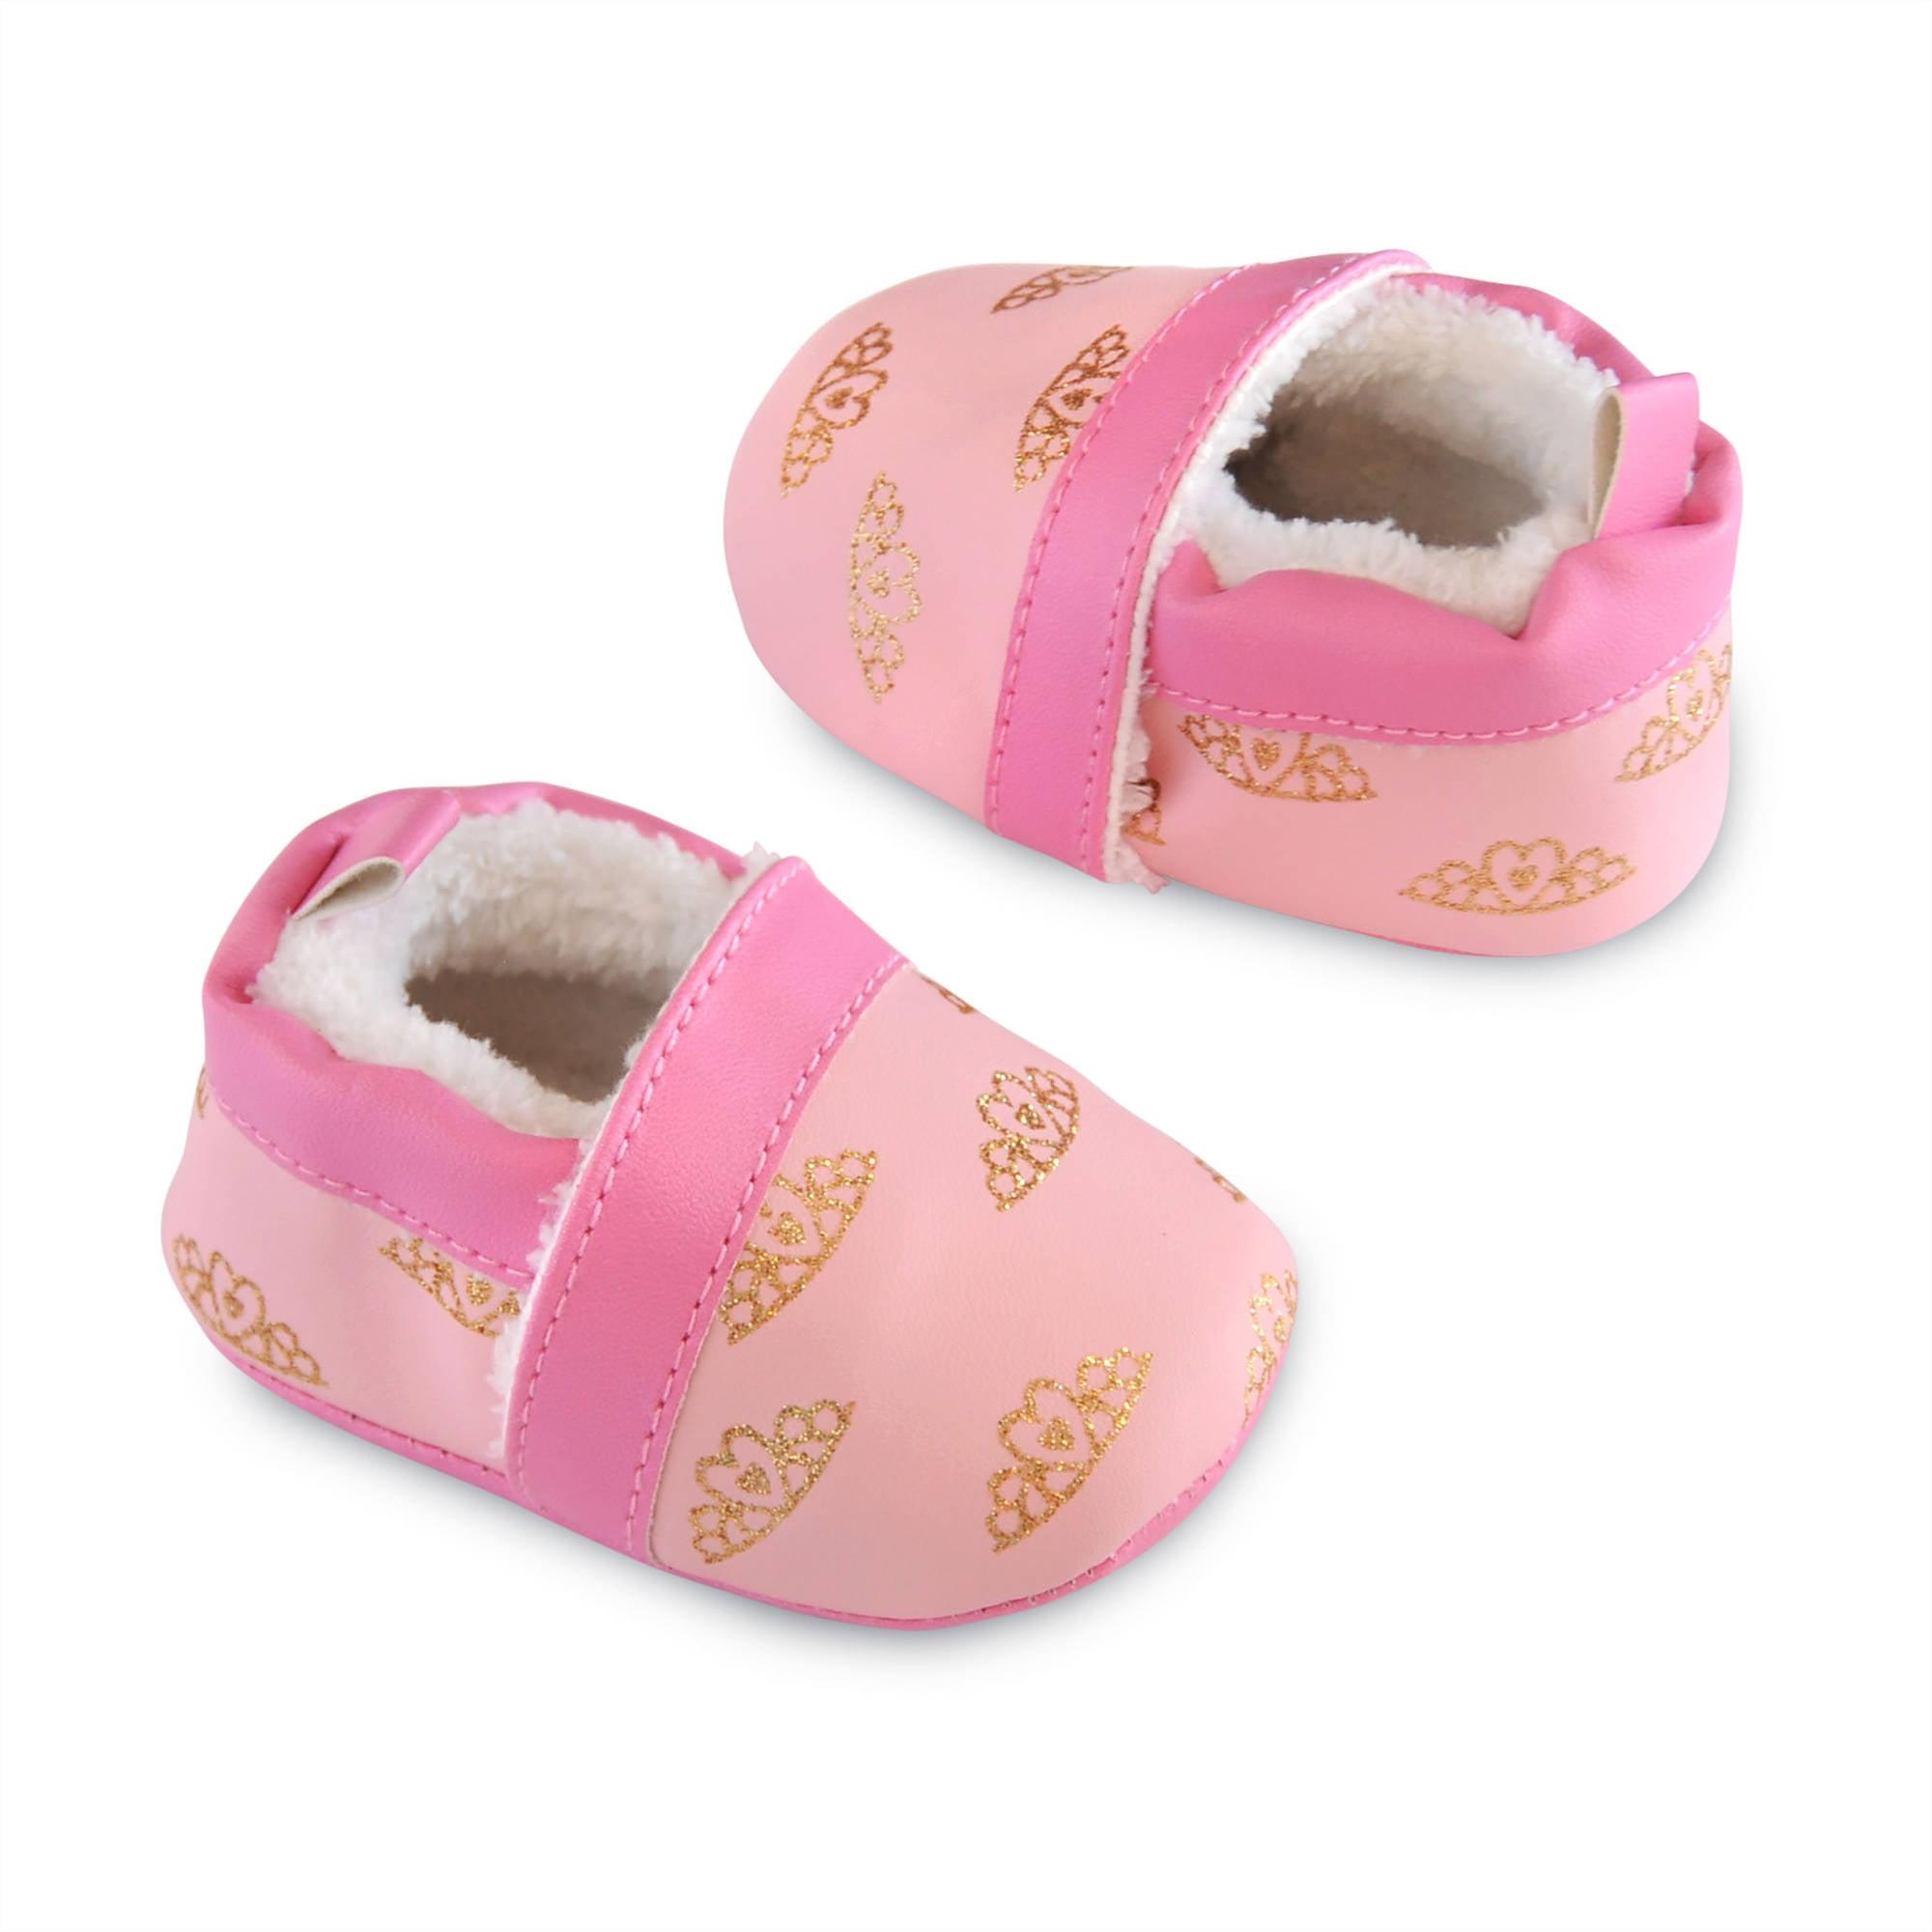 Newborn Baby Girl Princess Shoes, NB